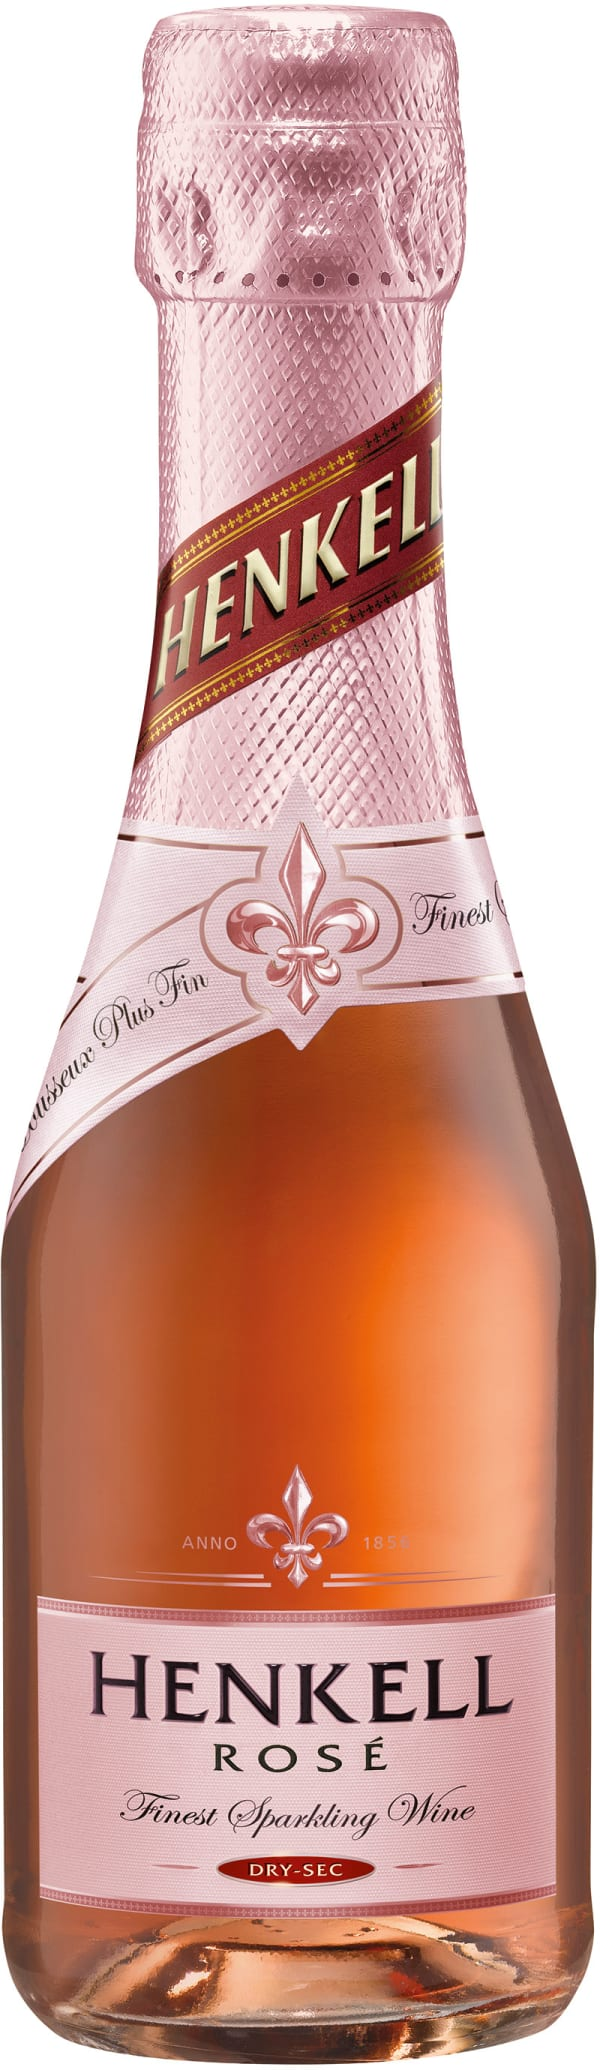 Henkell Piccolo Rosé Dry